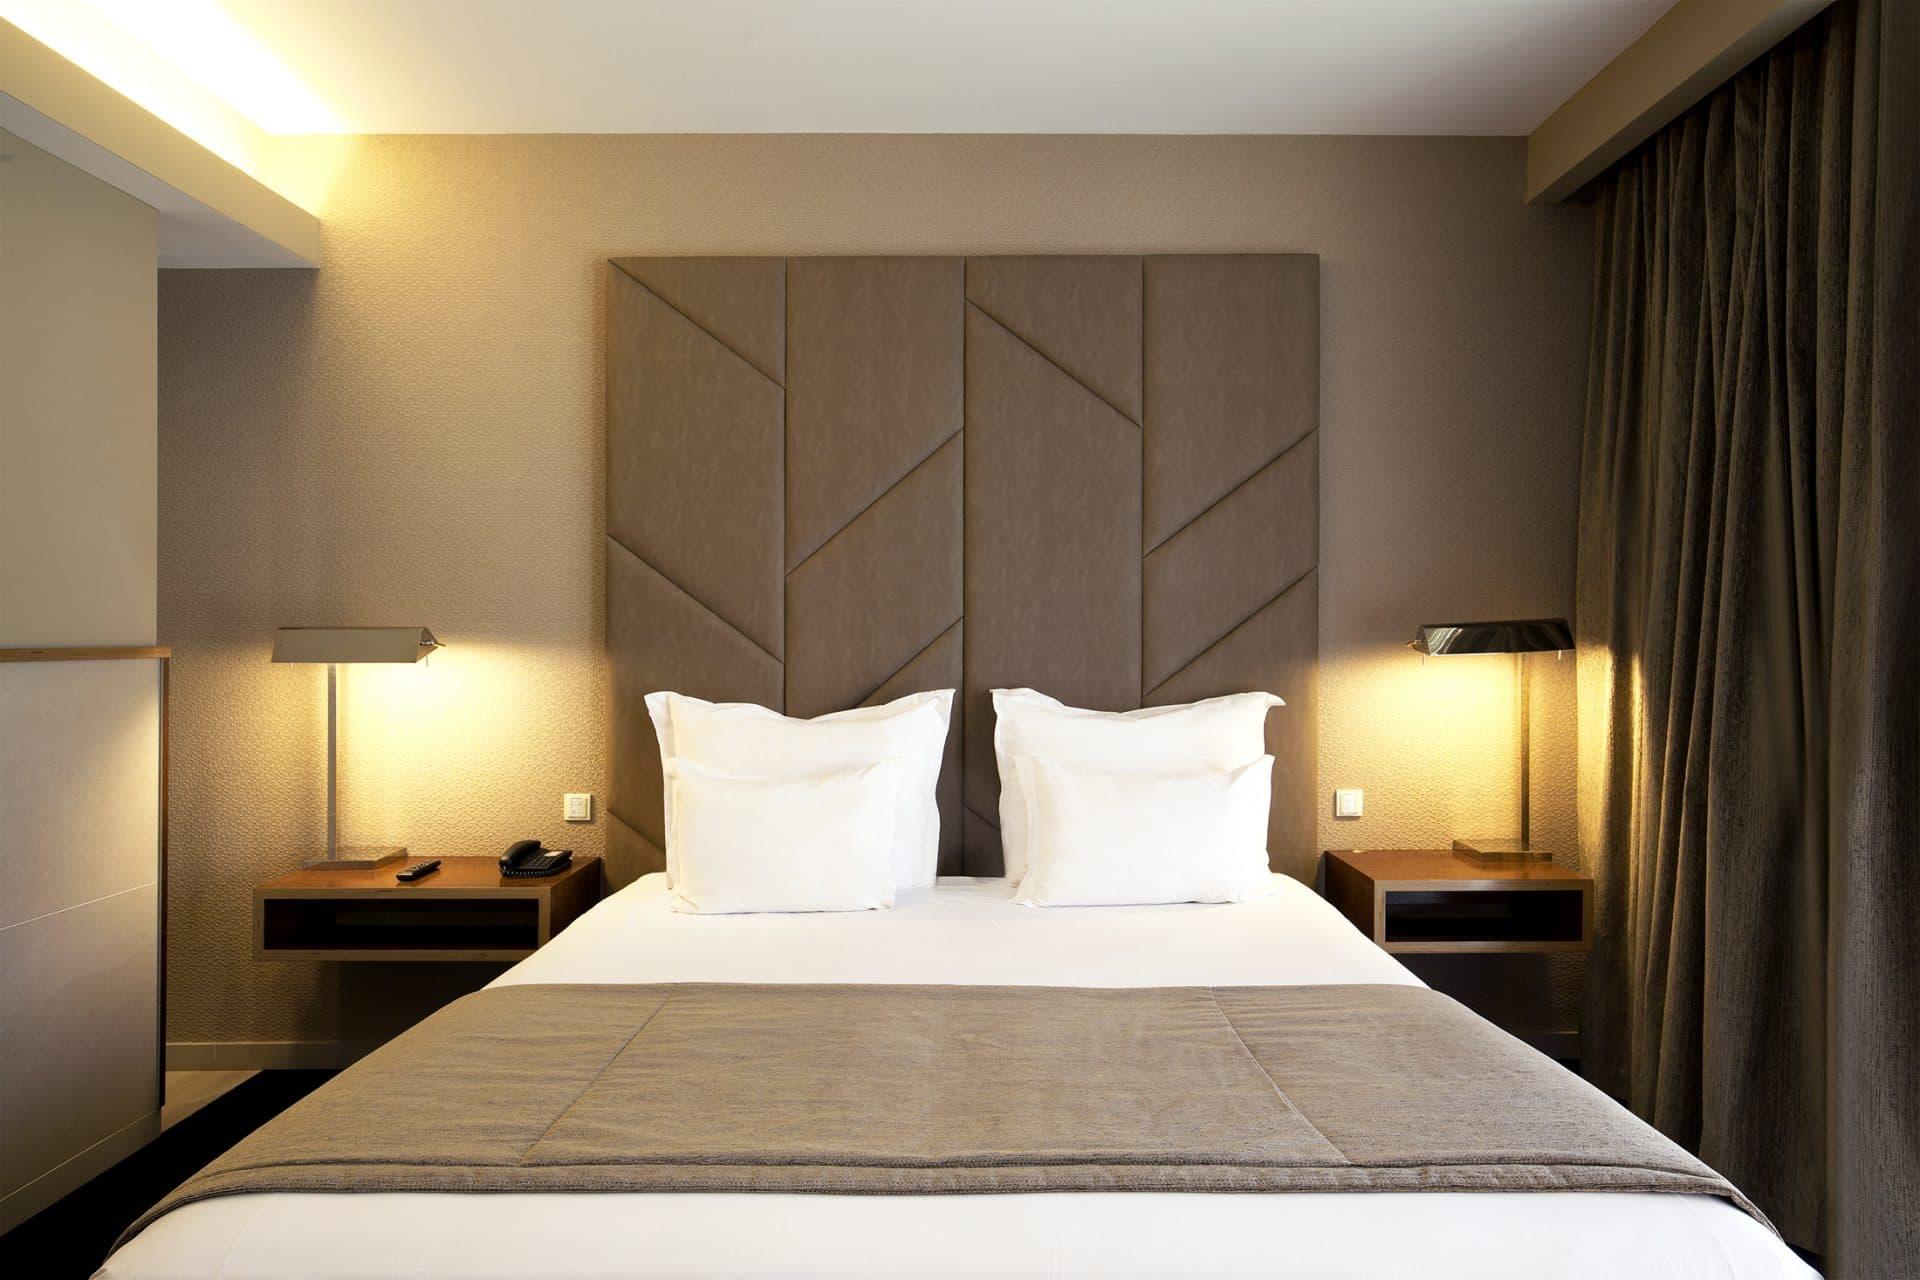 accommodation-superior-vidamar-hotels-resorts-algarve